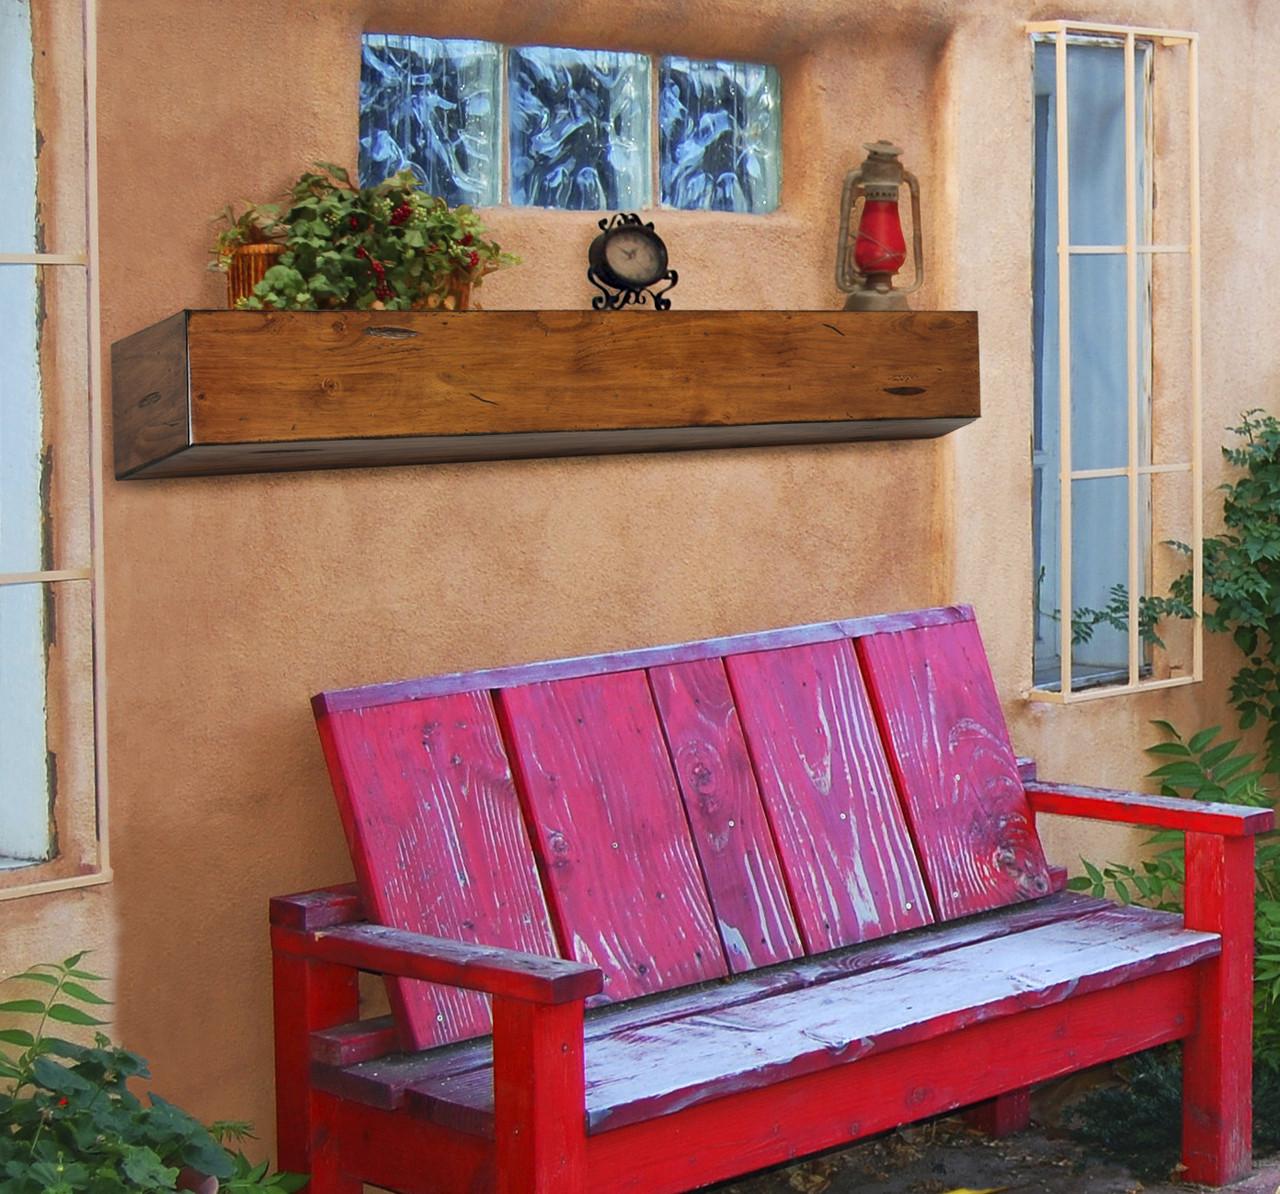 The Lexington 496 Fireplace Mantel Shelf, Life Style View 2